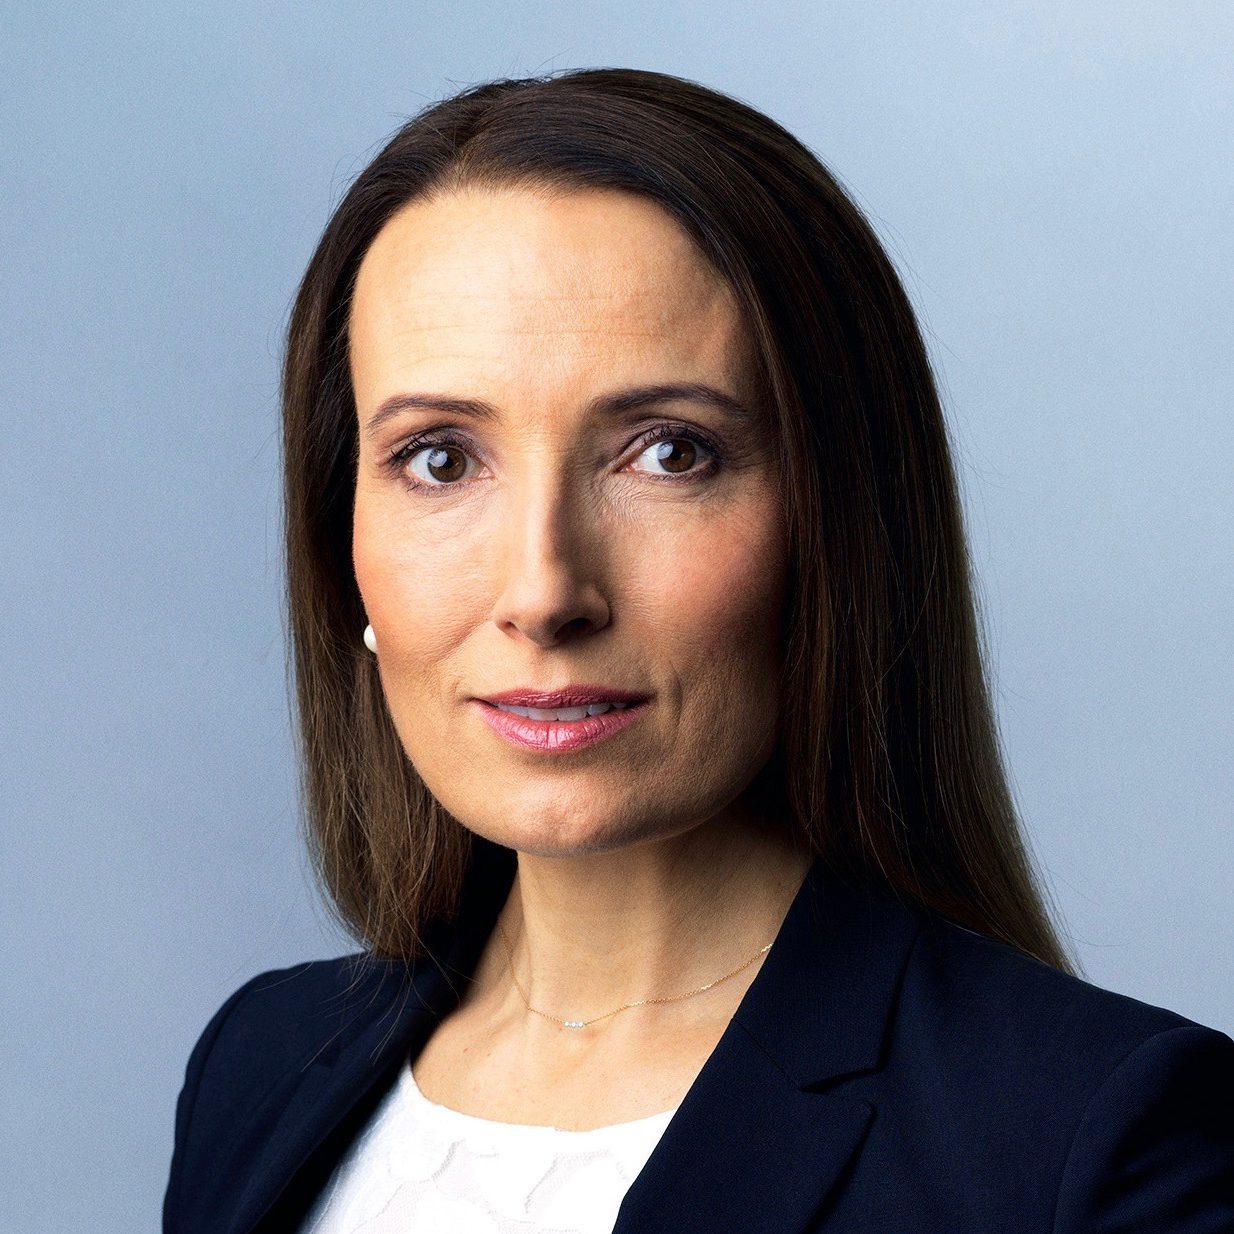 Dr. Heidi STENSMYREN